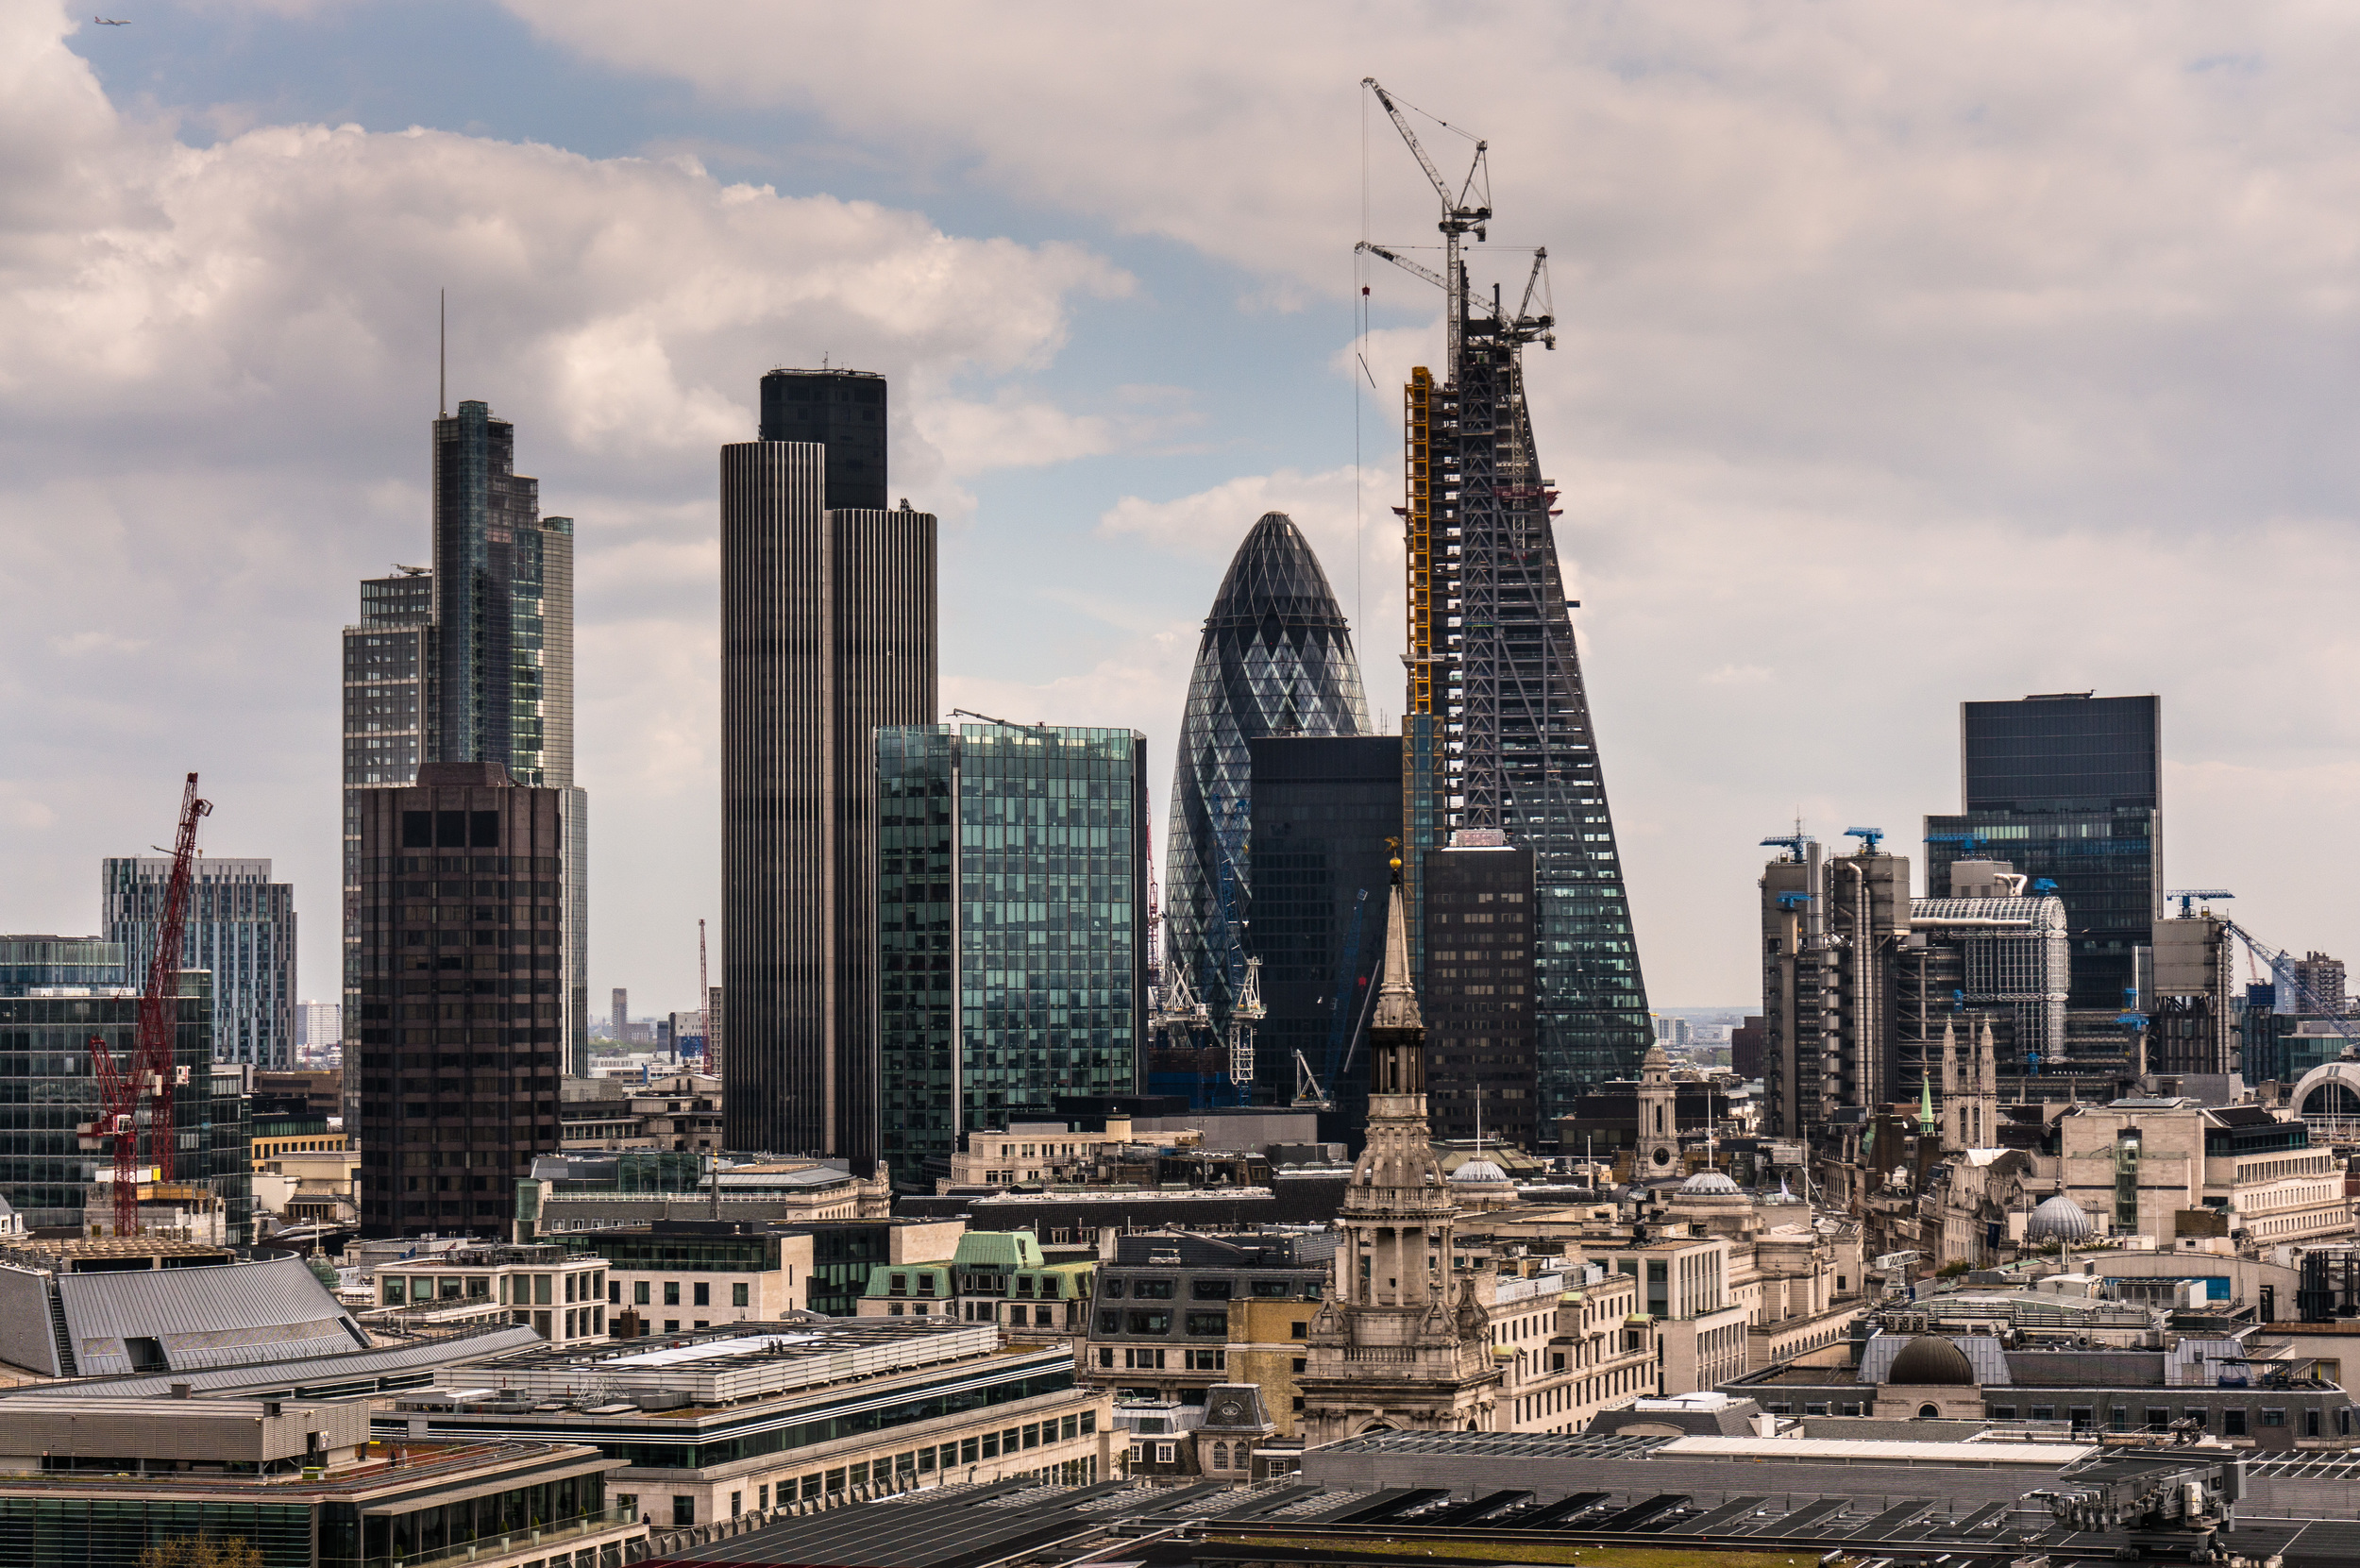 London Photographs